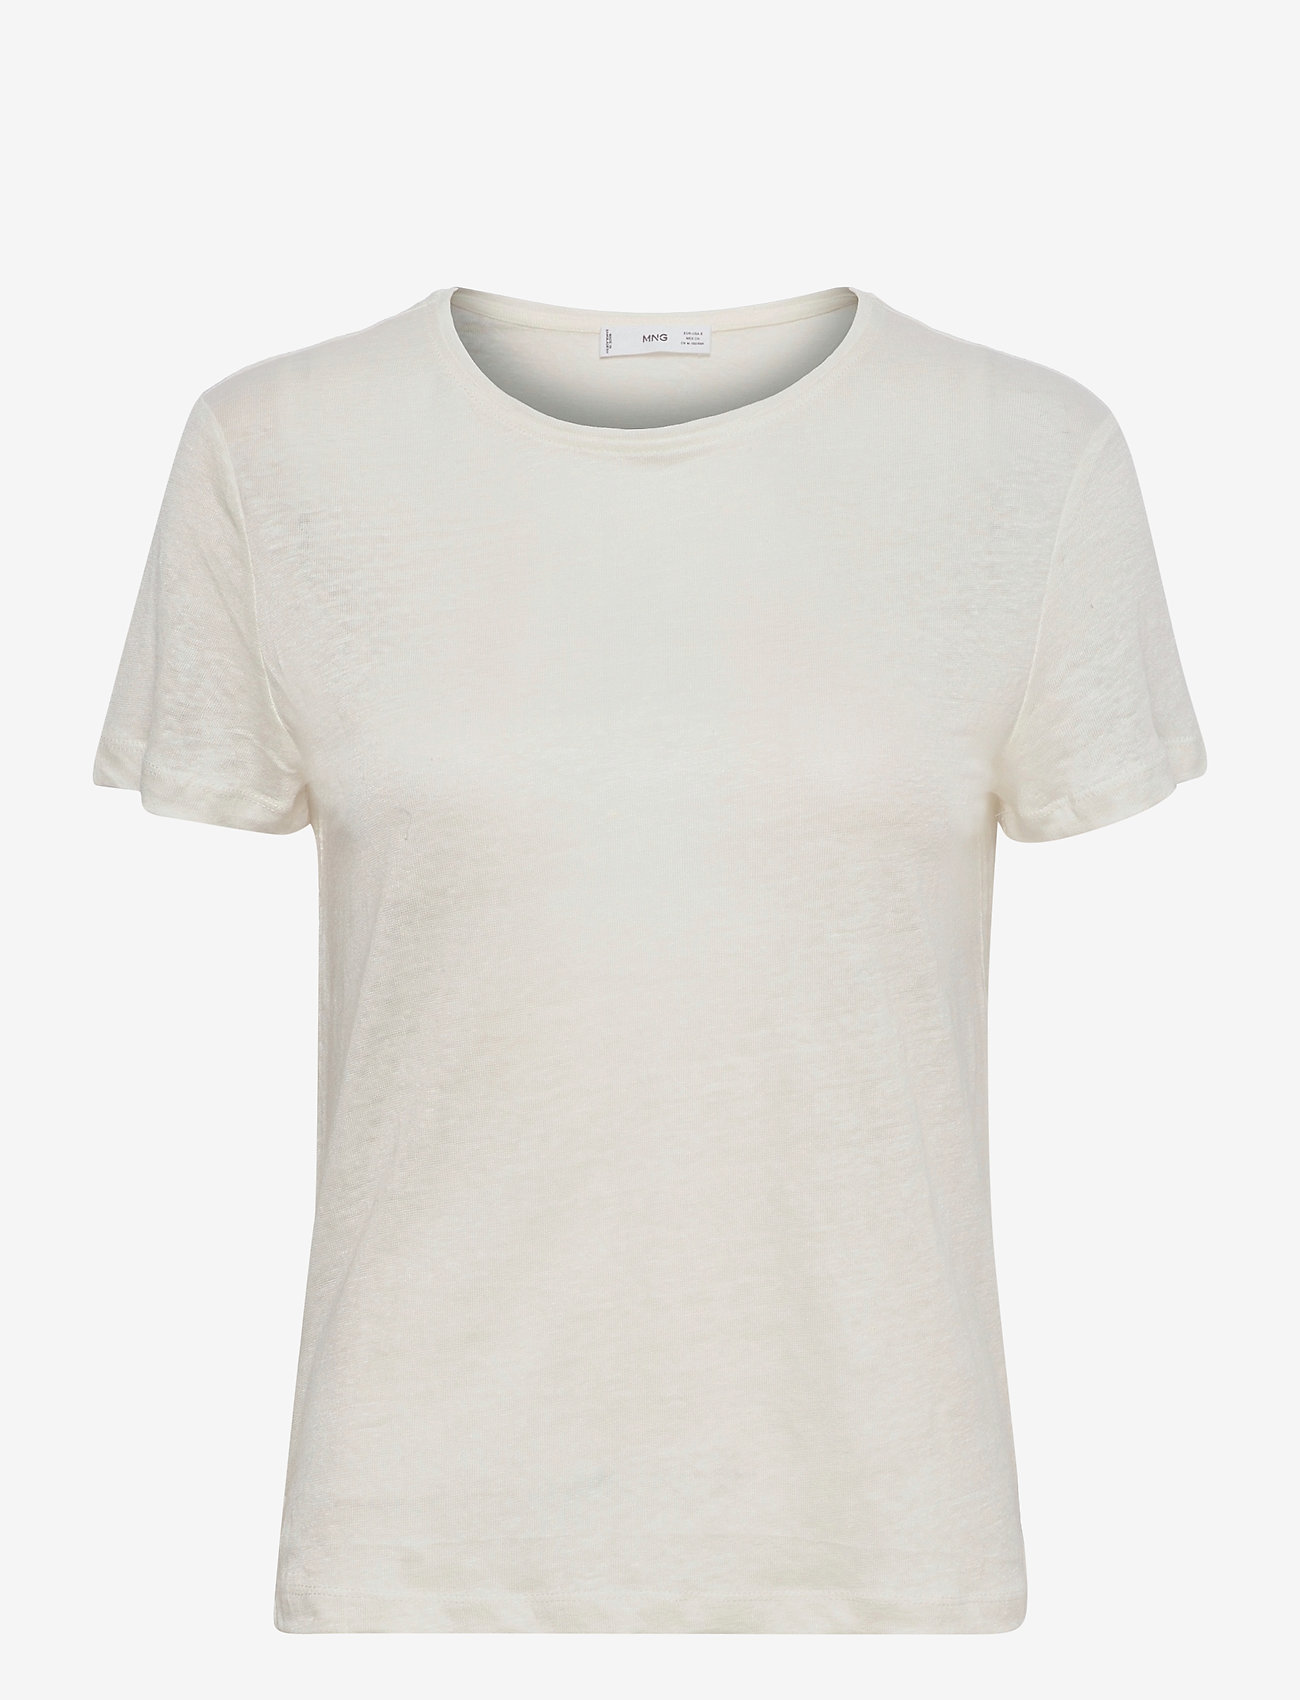 Mango - LISINO - t-shirts - offwhite - 0